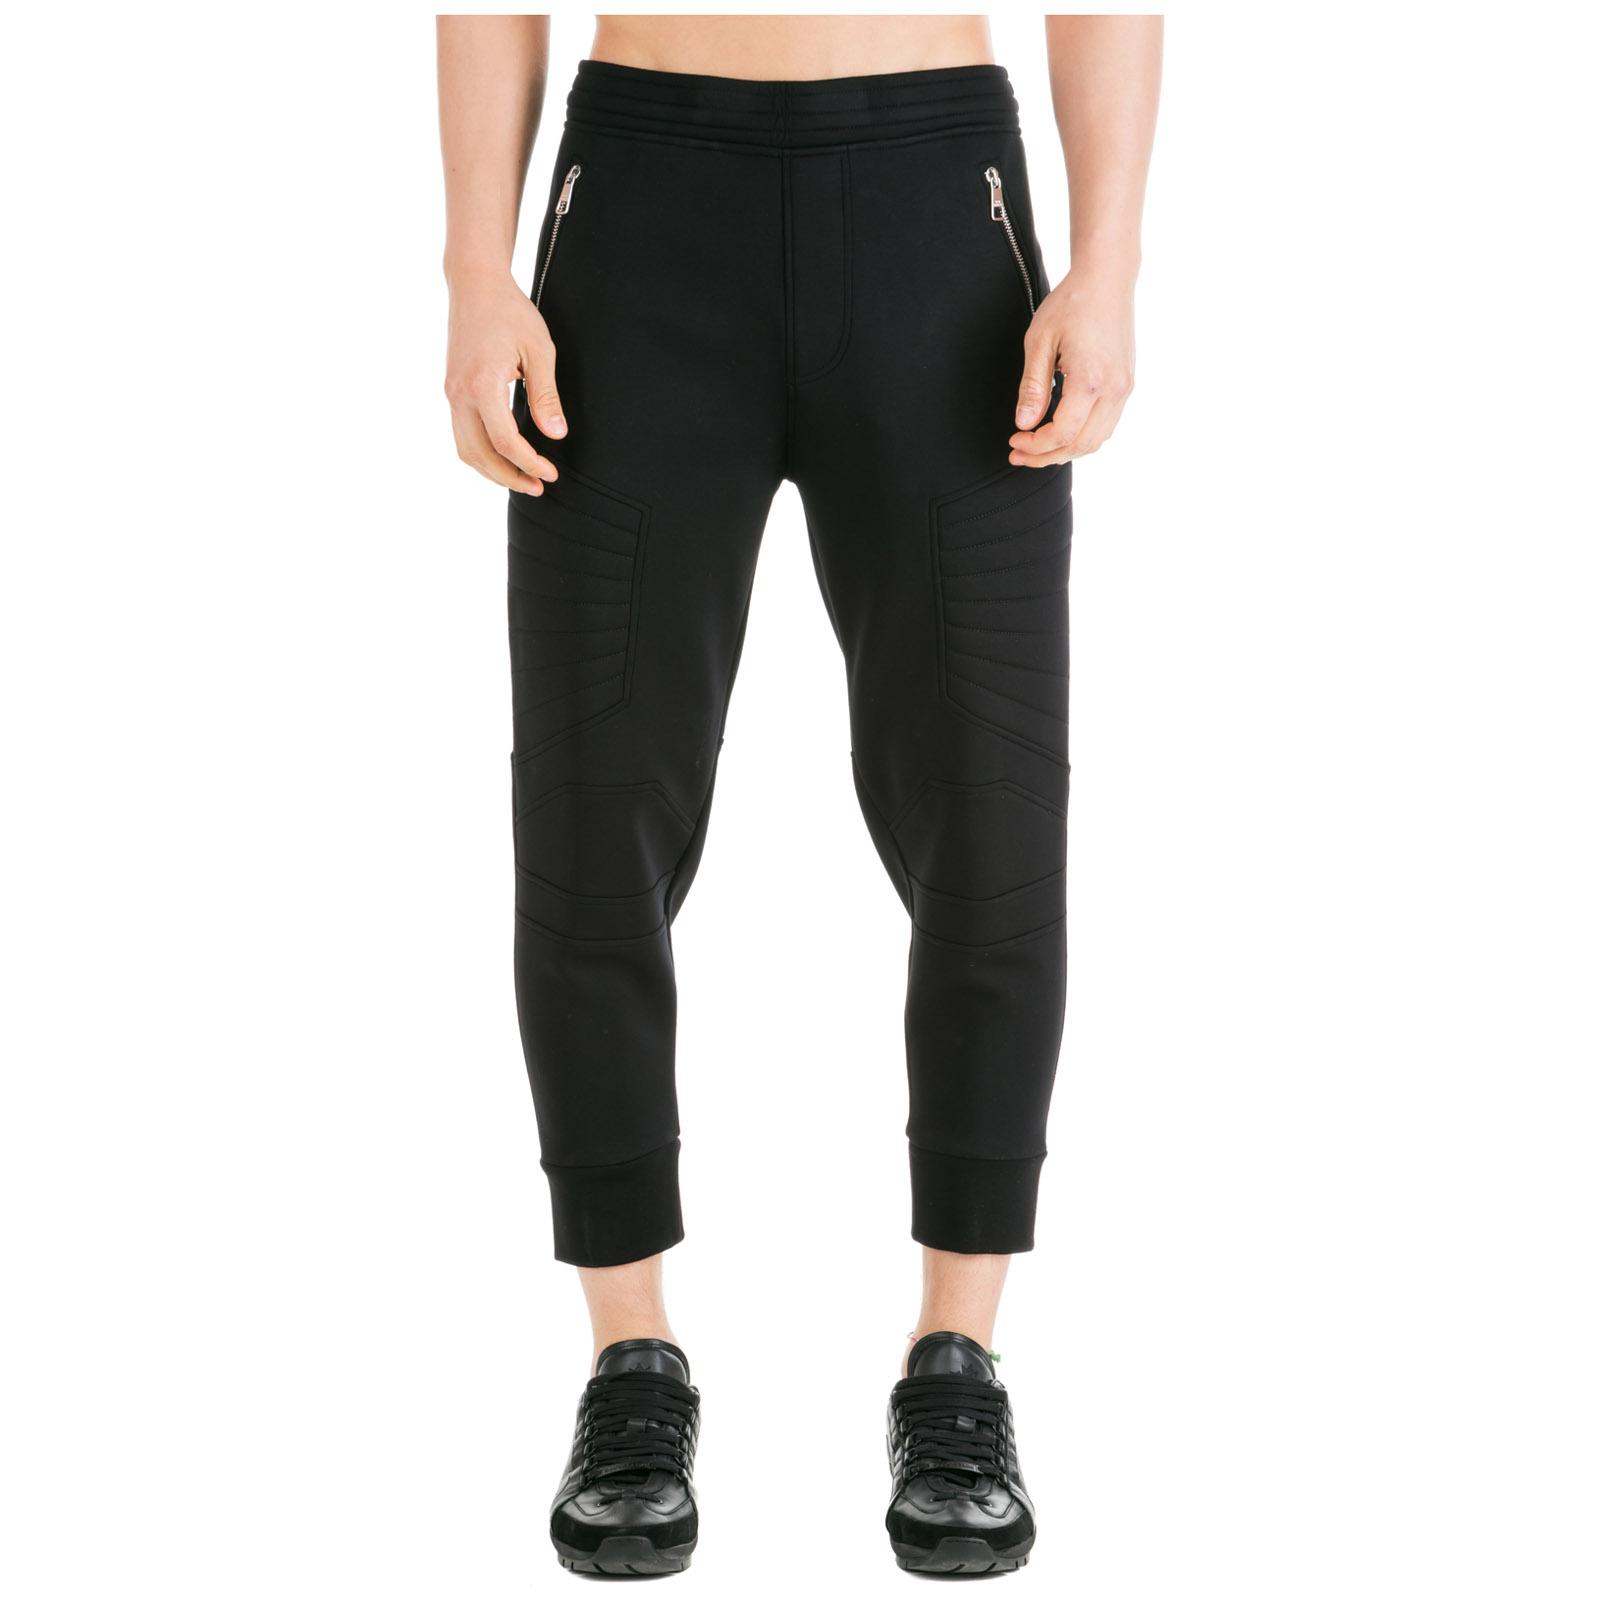 Neil Barrett Men's sport tracksuit trousers travel motocross skinny  - Black - Size: Extra Large